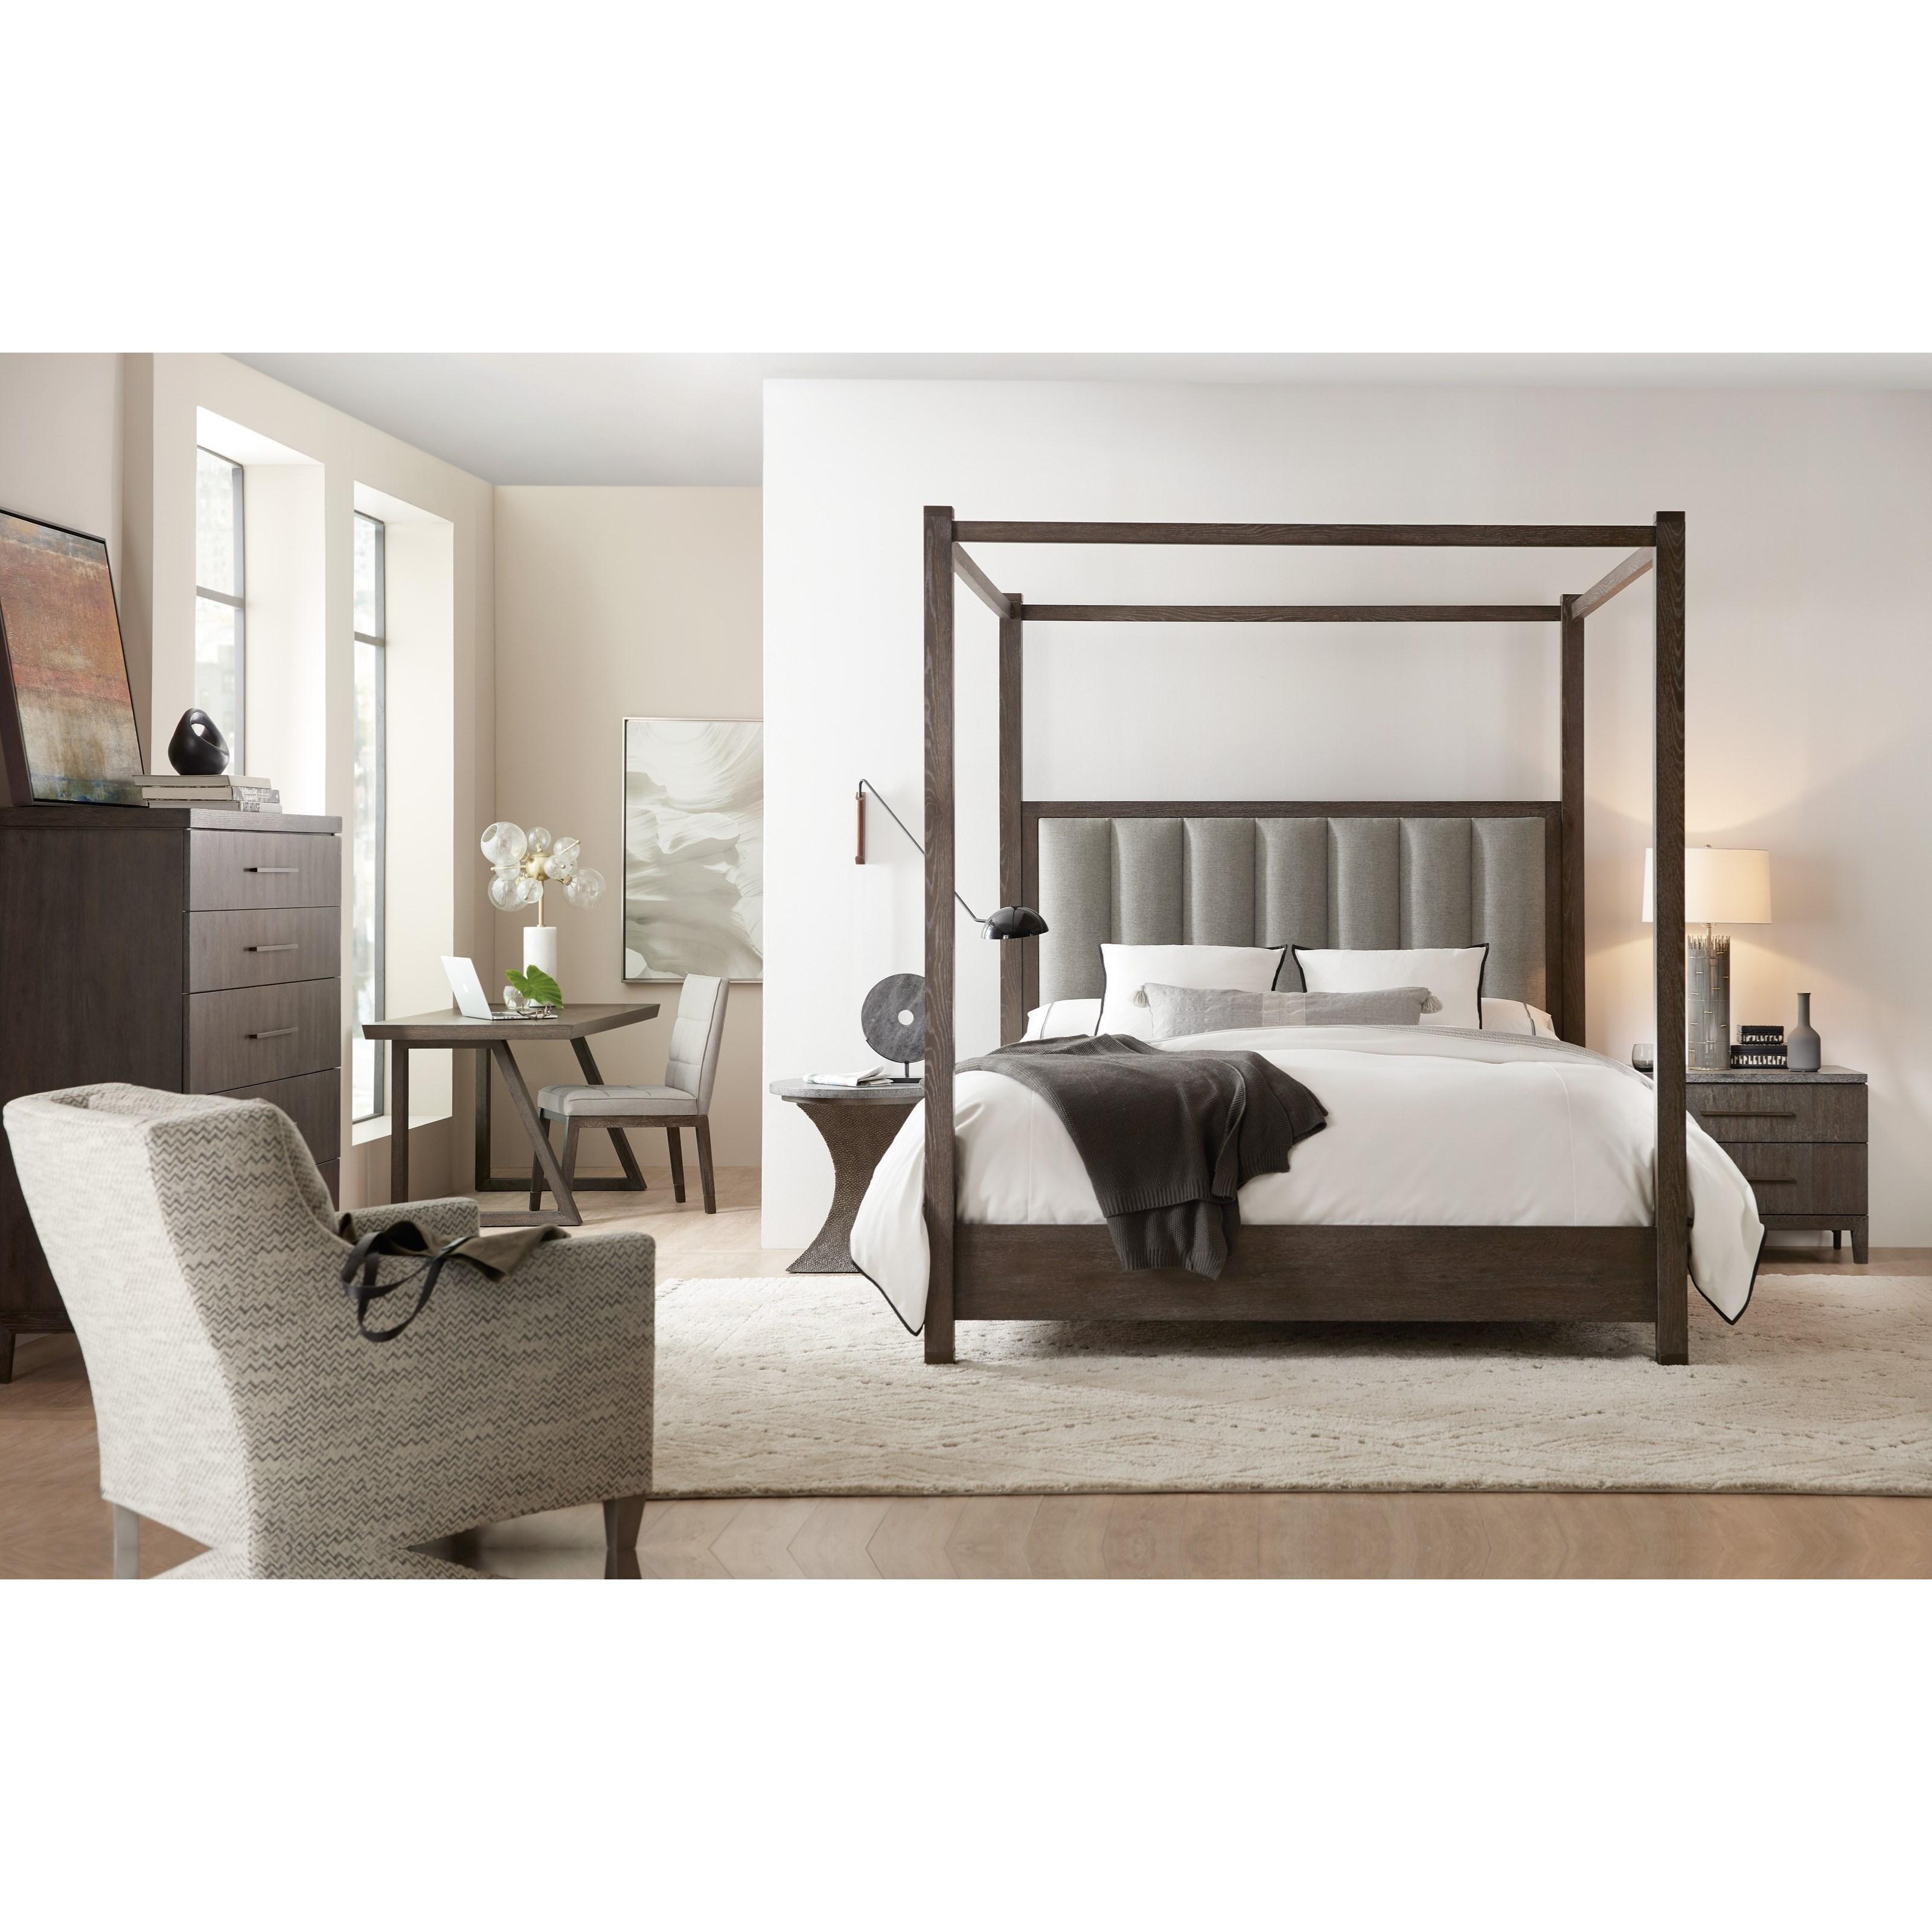 Miramar Aventura Queen Bedroom Group at Williams & Kay